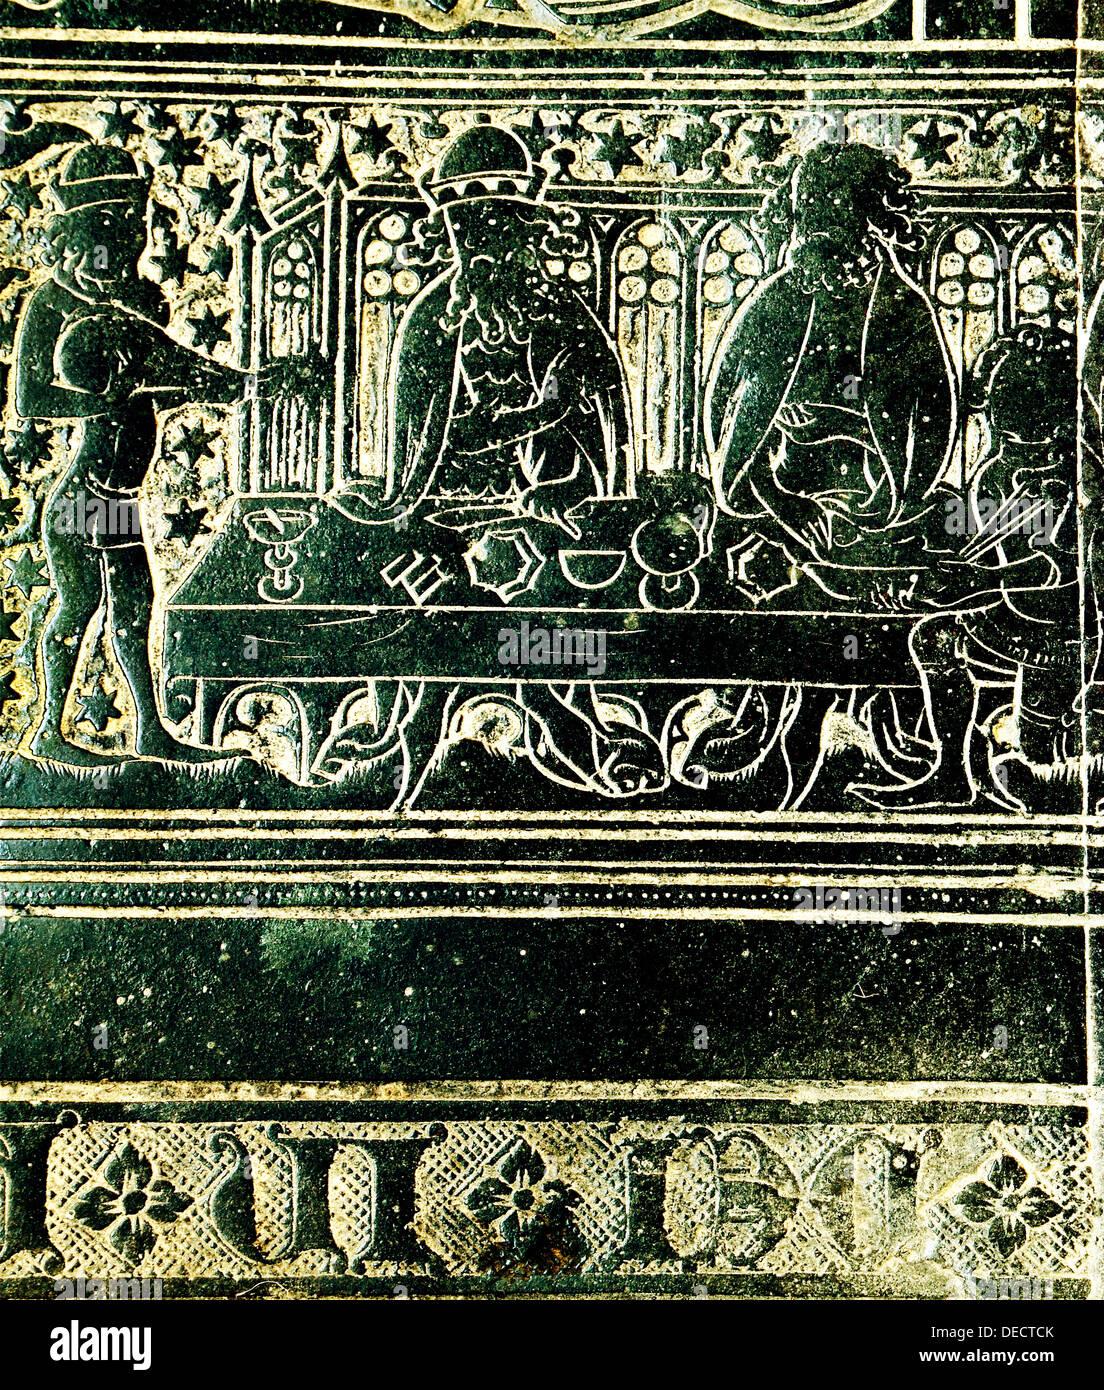 Das Peacock fest für König Edward 3., im Jahre 1349, Detail aus Messing, Robert Braunche, St.-Margarethen Kirche, Kings Lynn Stockbild